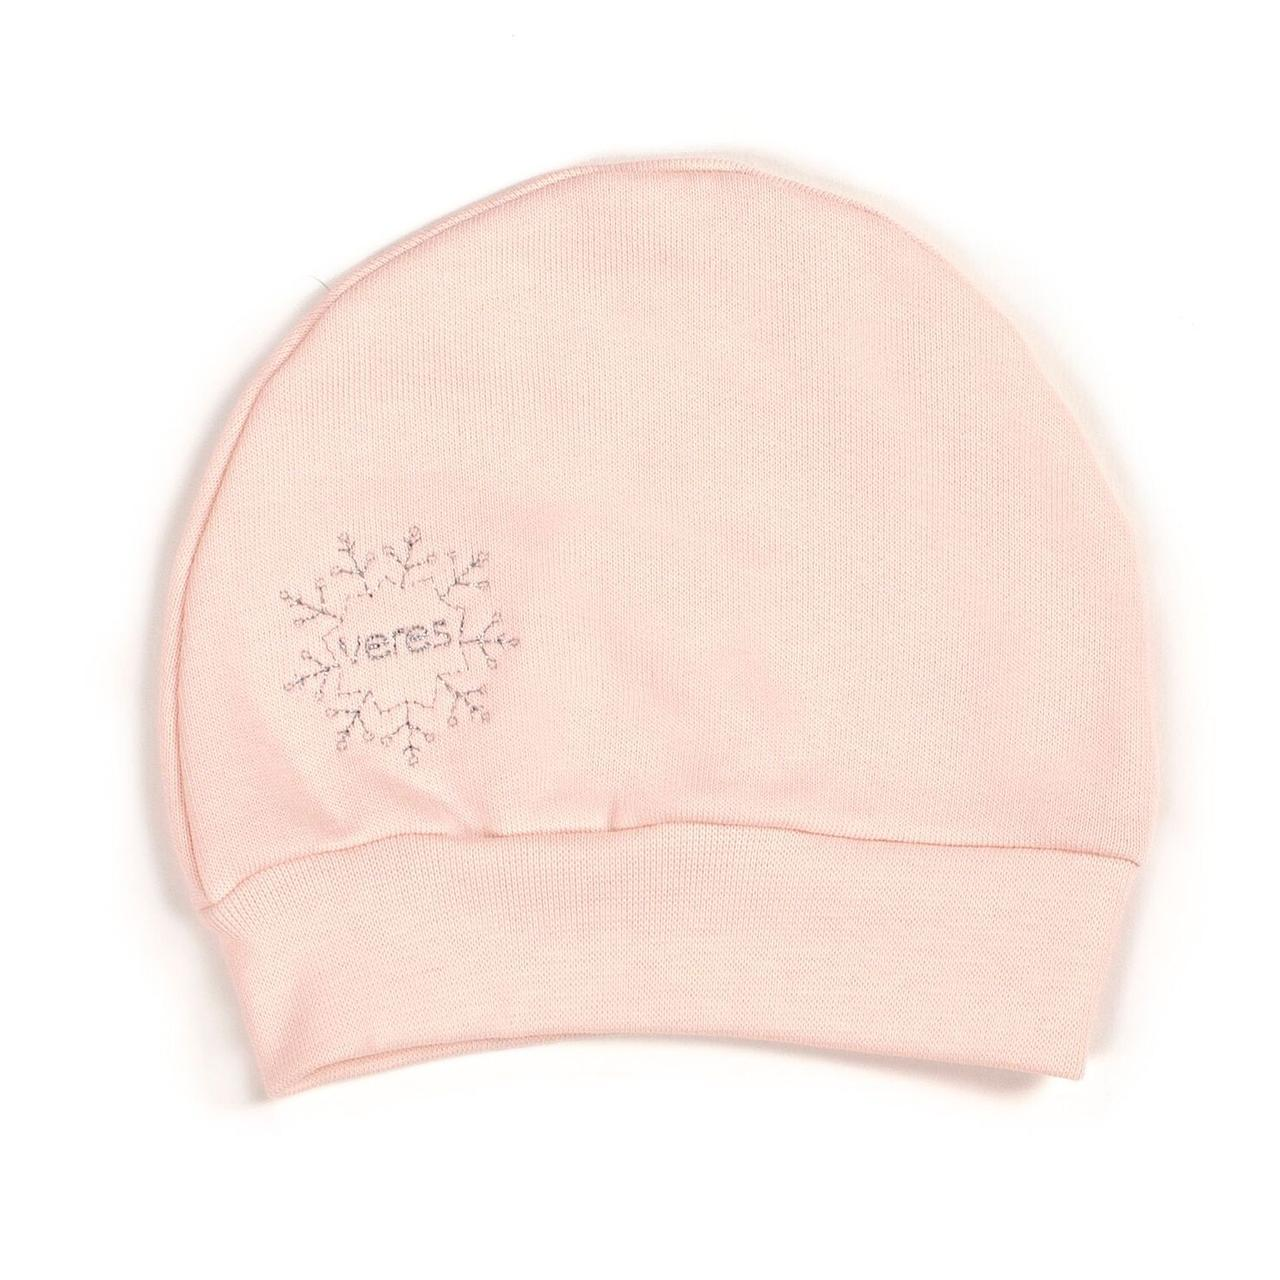 Шапочка Верес Snowflake  футер з начесом розовый